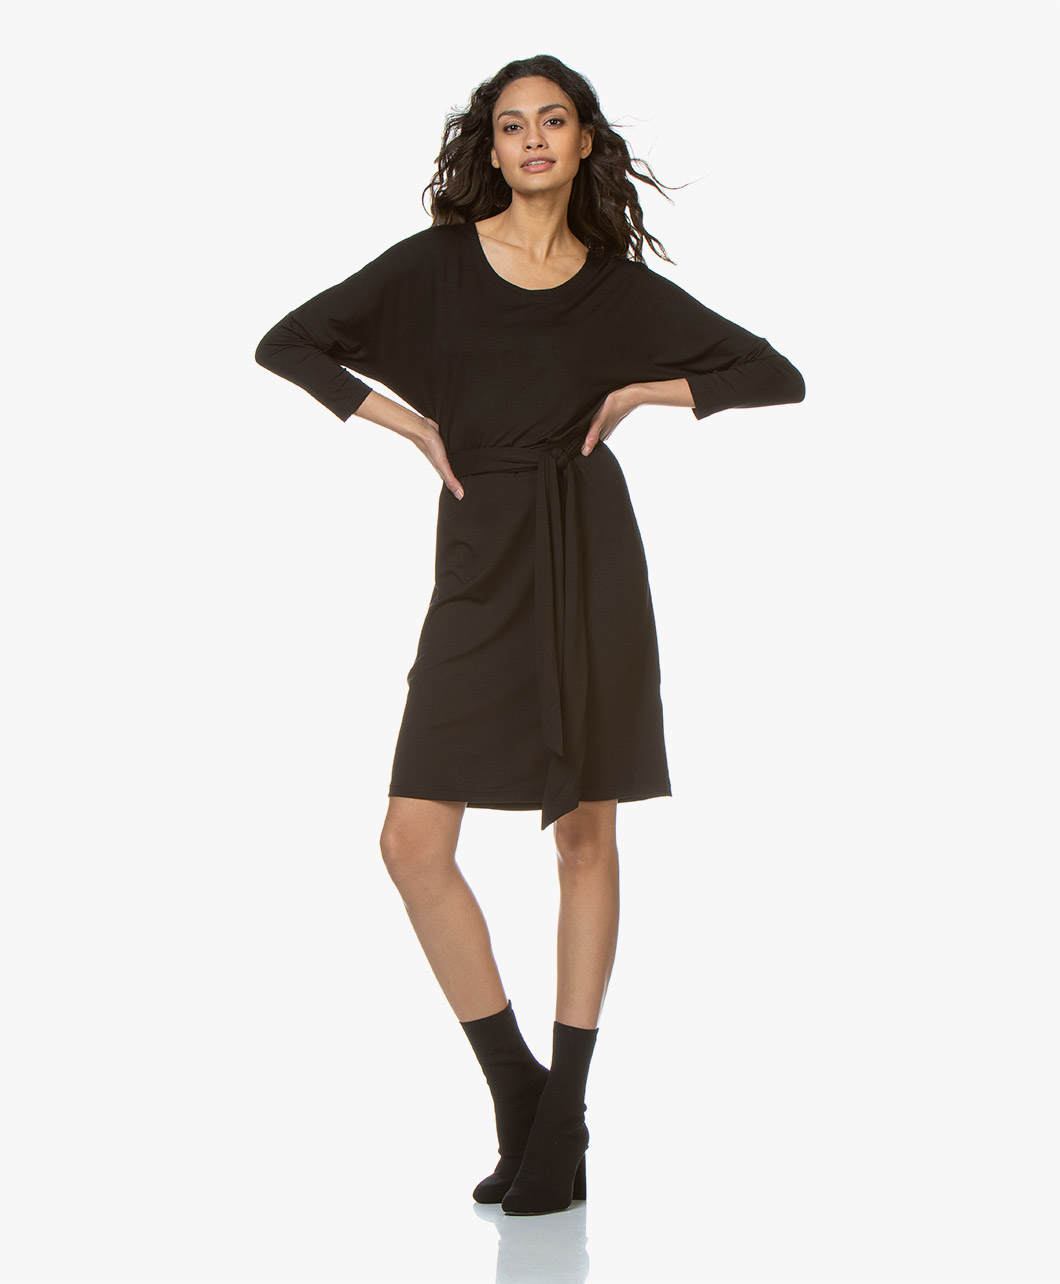 b488b28f1c6d33 LaSalle Lyocell Jersey Dress - Black - vi.02